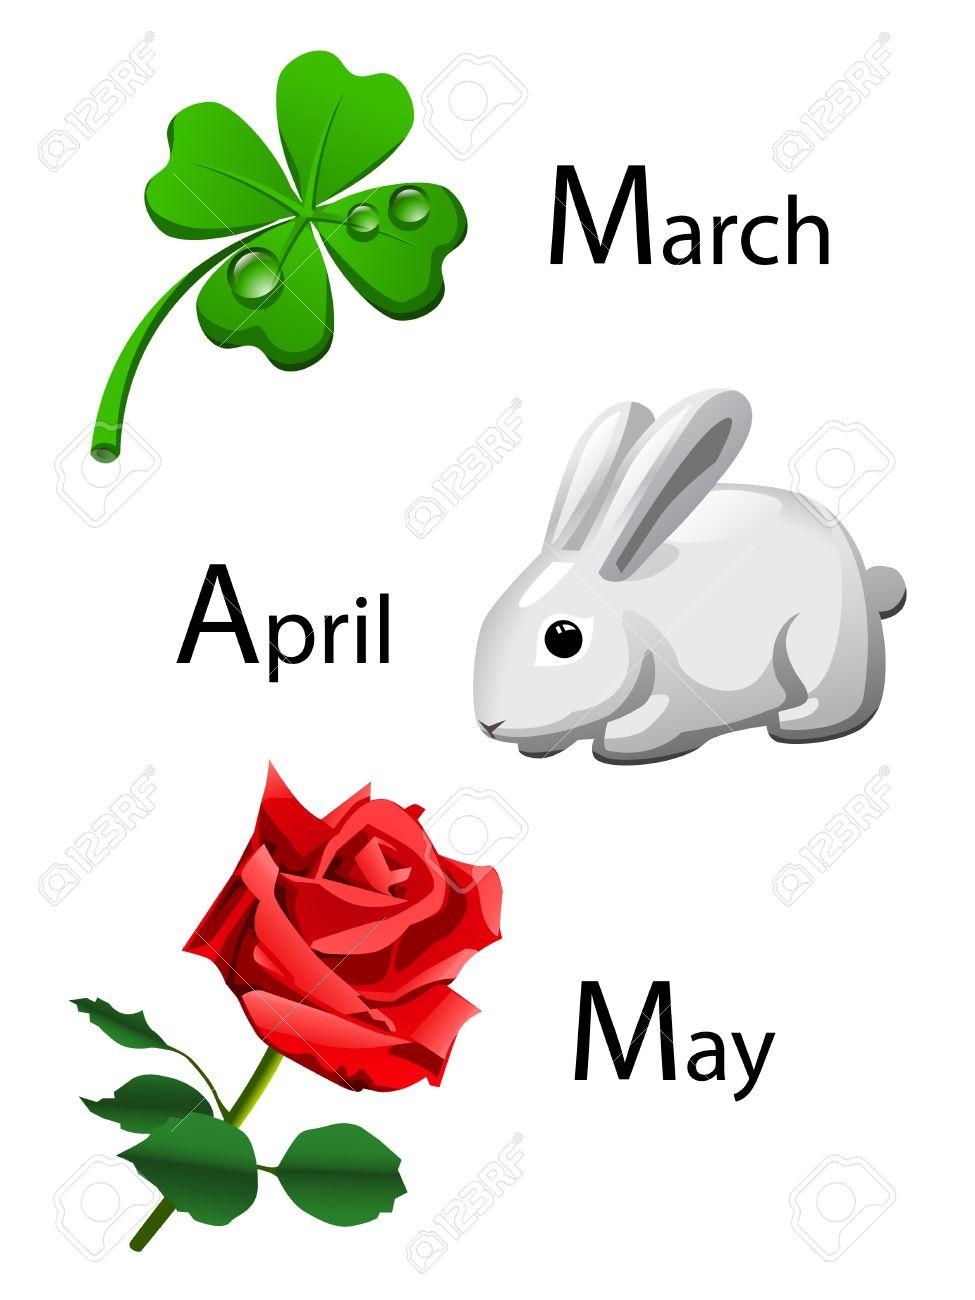 spring calendar - march, april, may Stock Vector - 10385859